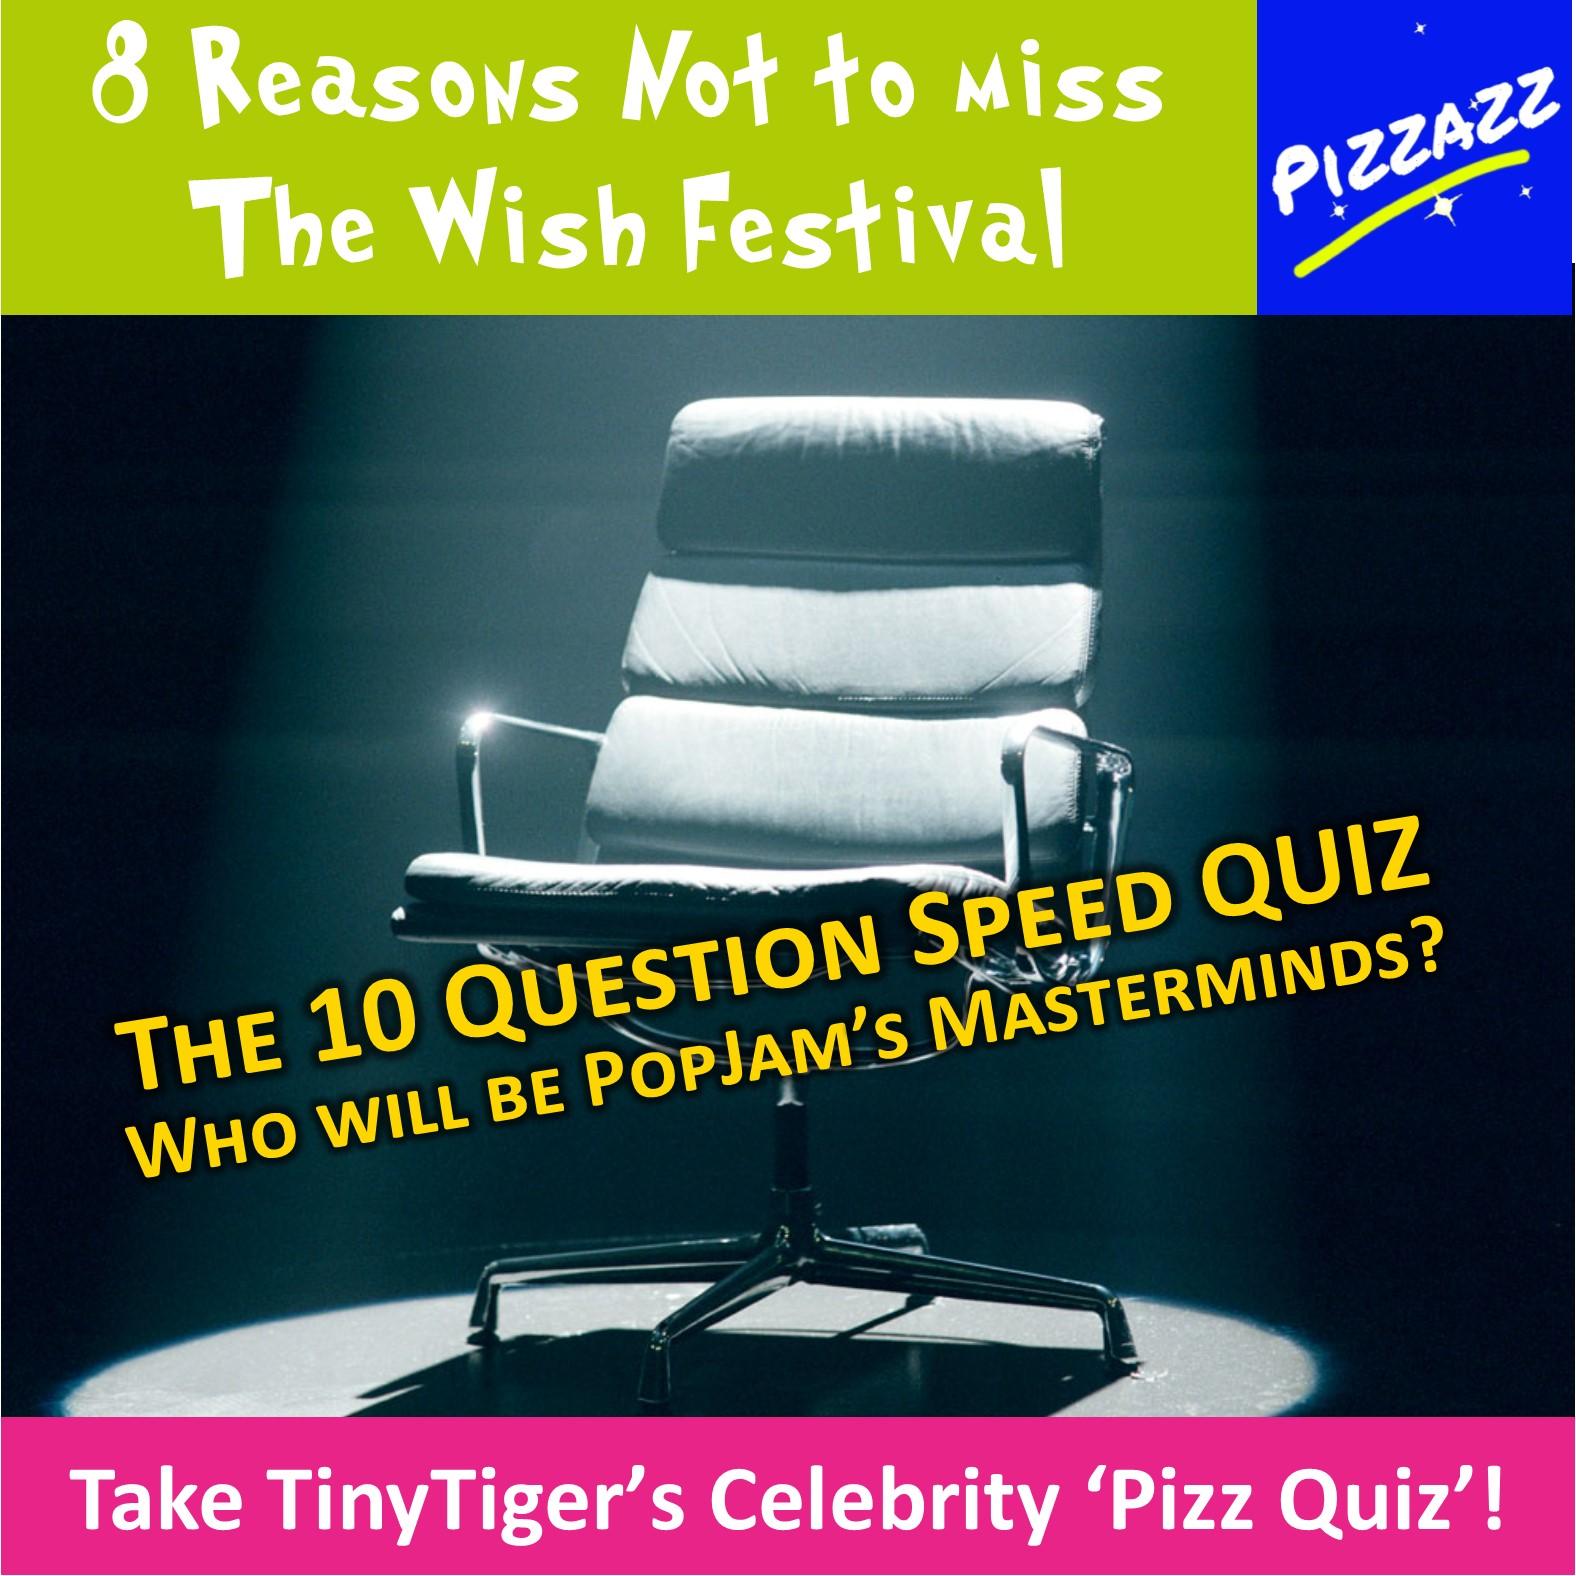 Beatie Wolfe - Wish Festival - 8 reasons - TinyTiger.jpg